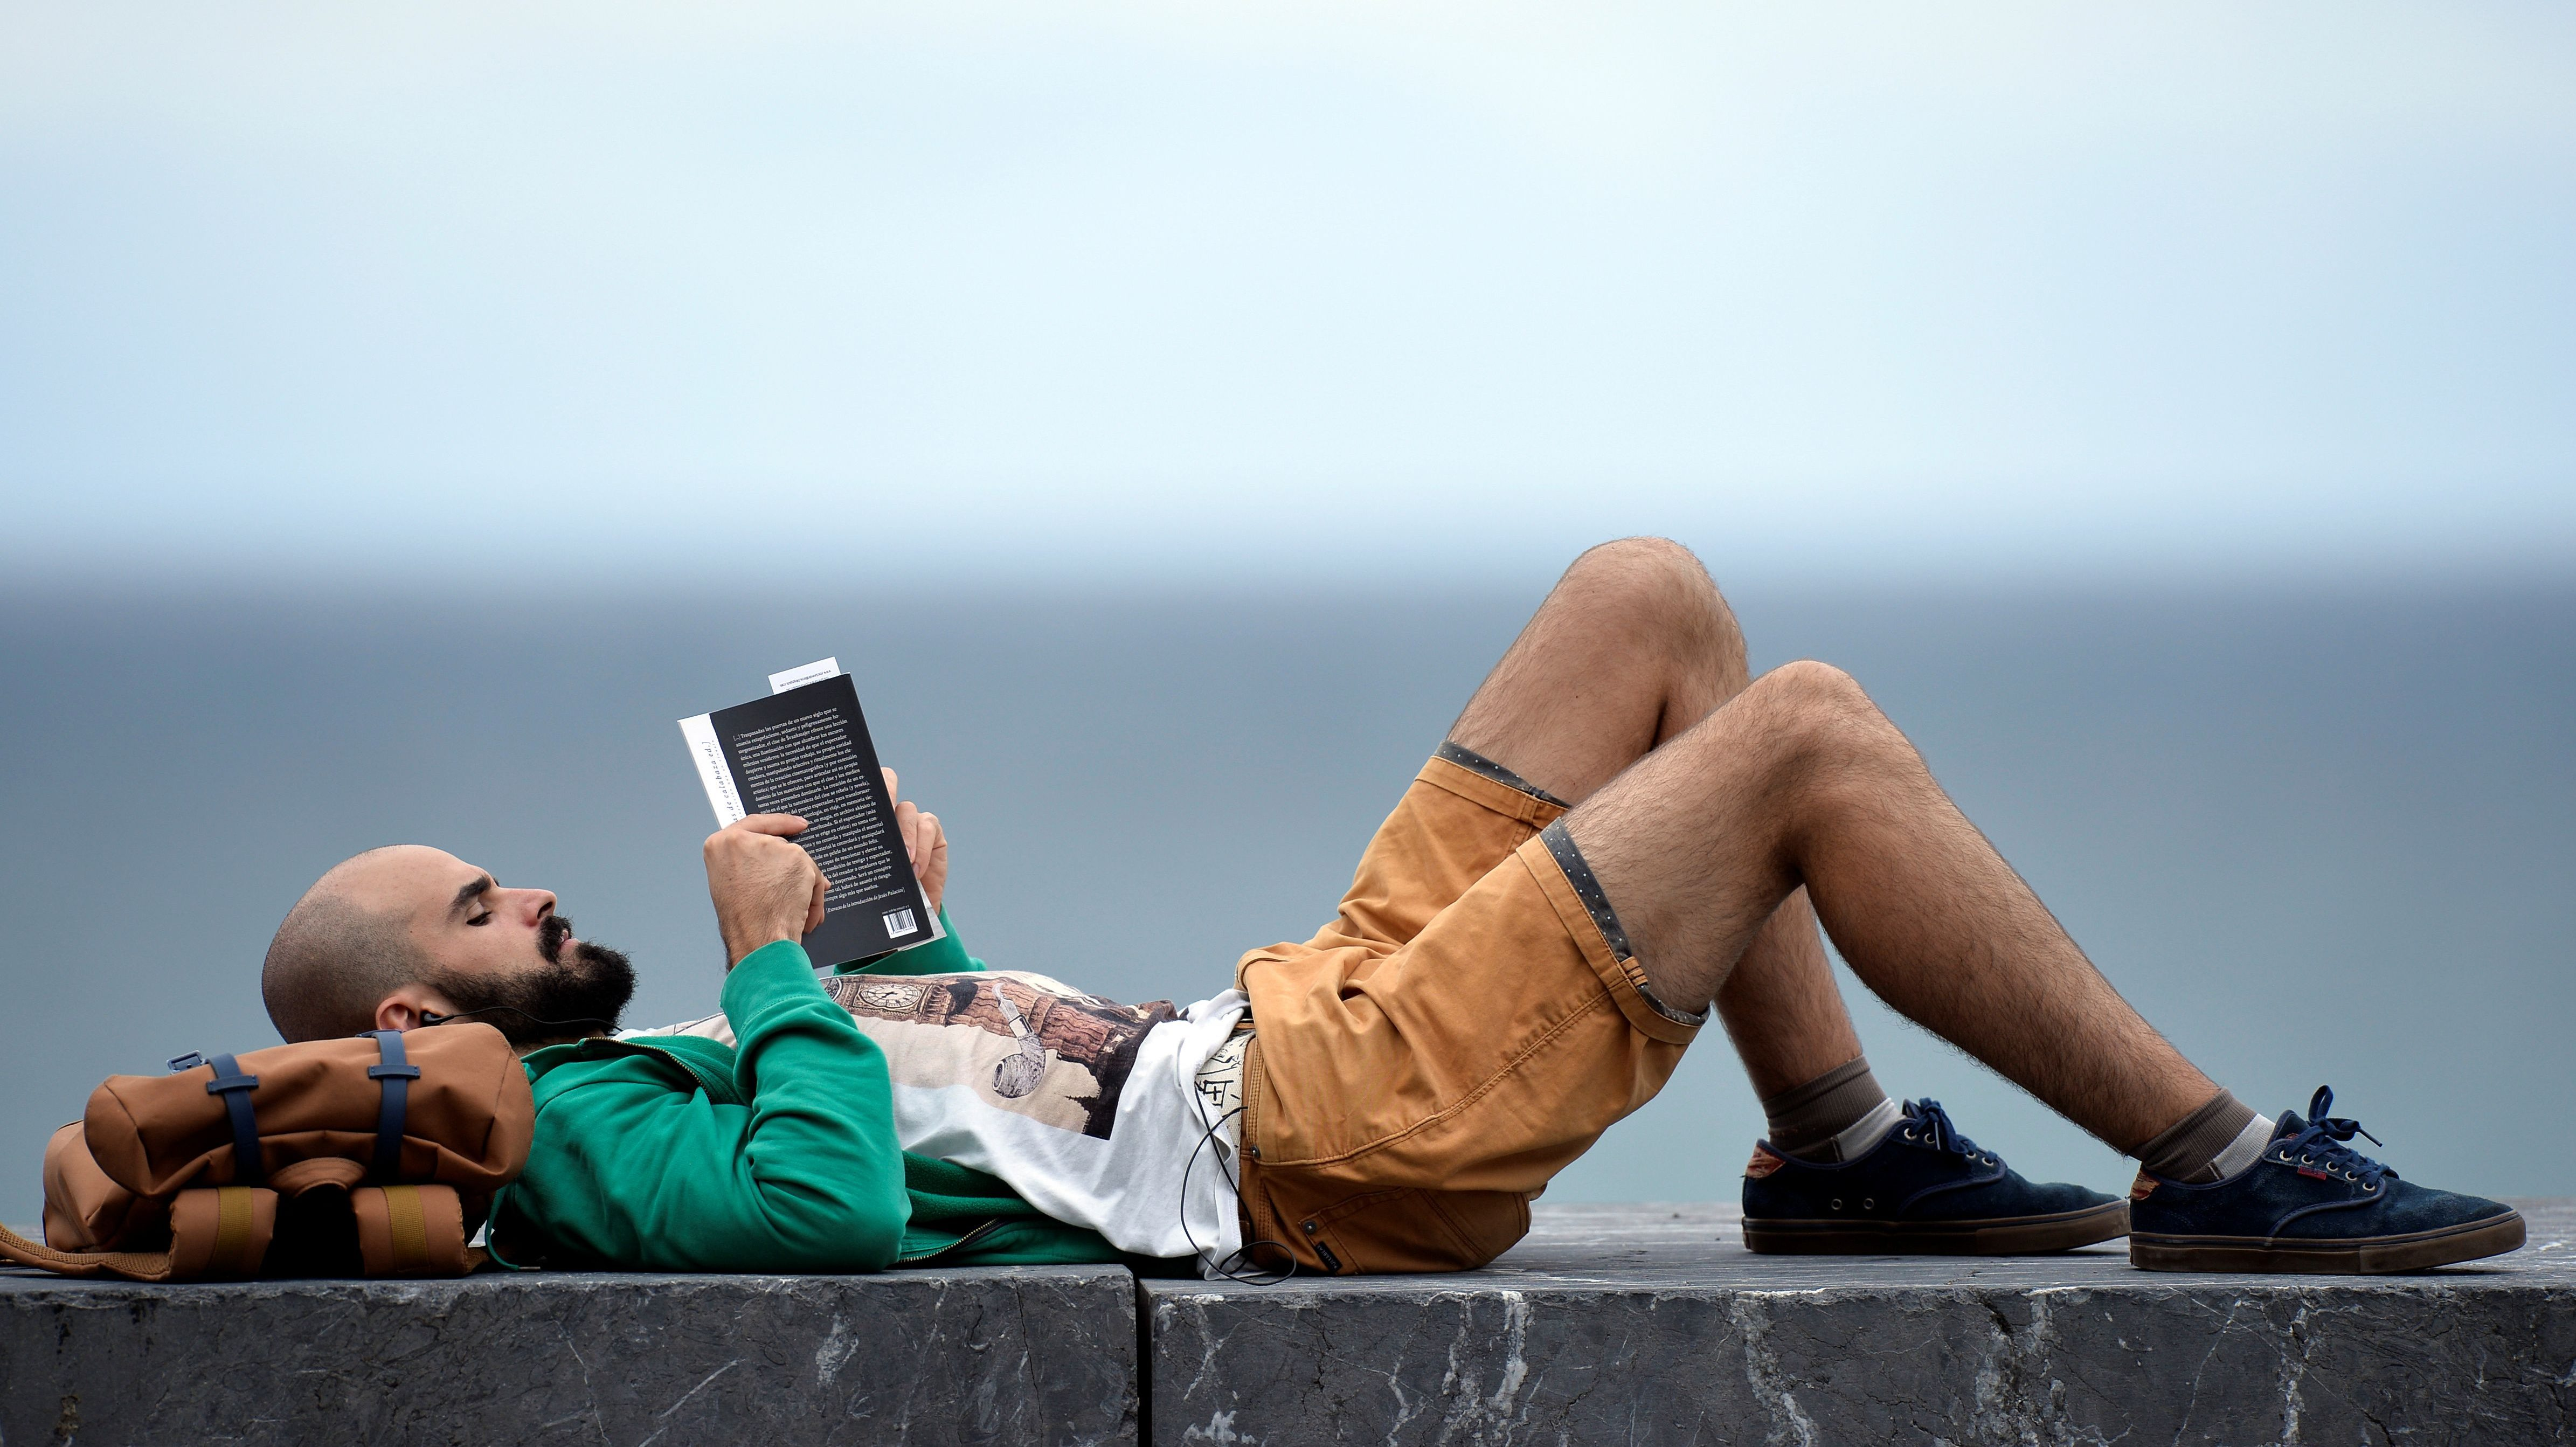 A man reads a book near a photocall at the San Sebastian Film Festival in San Sebastian, Spain, September 22, 2017.